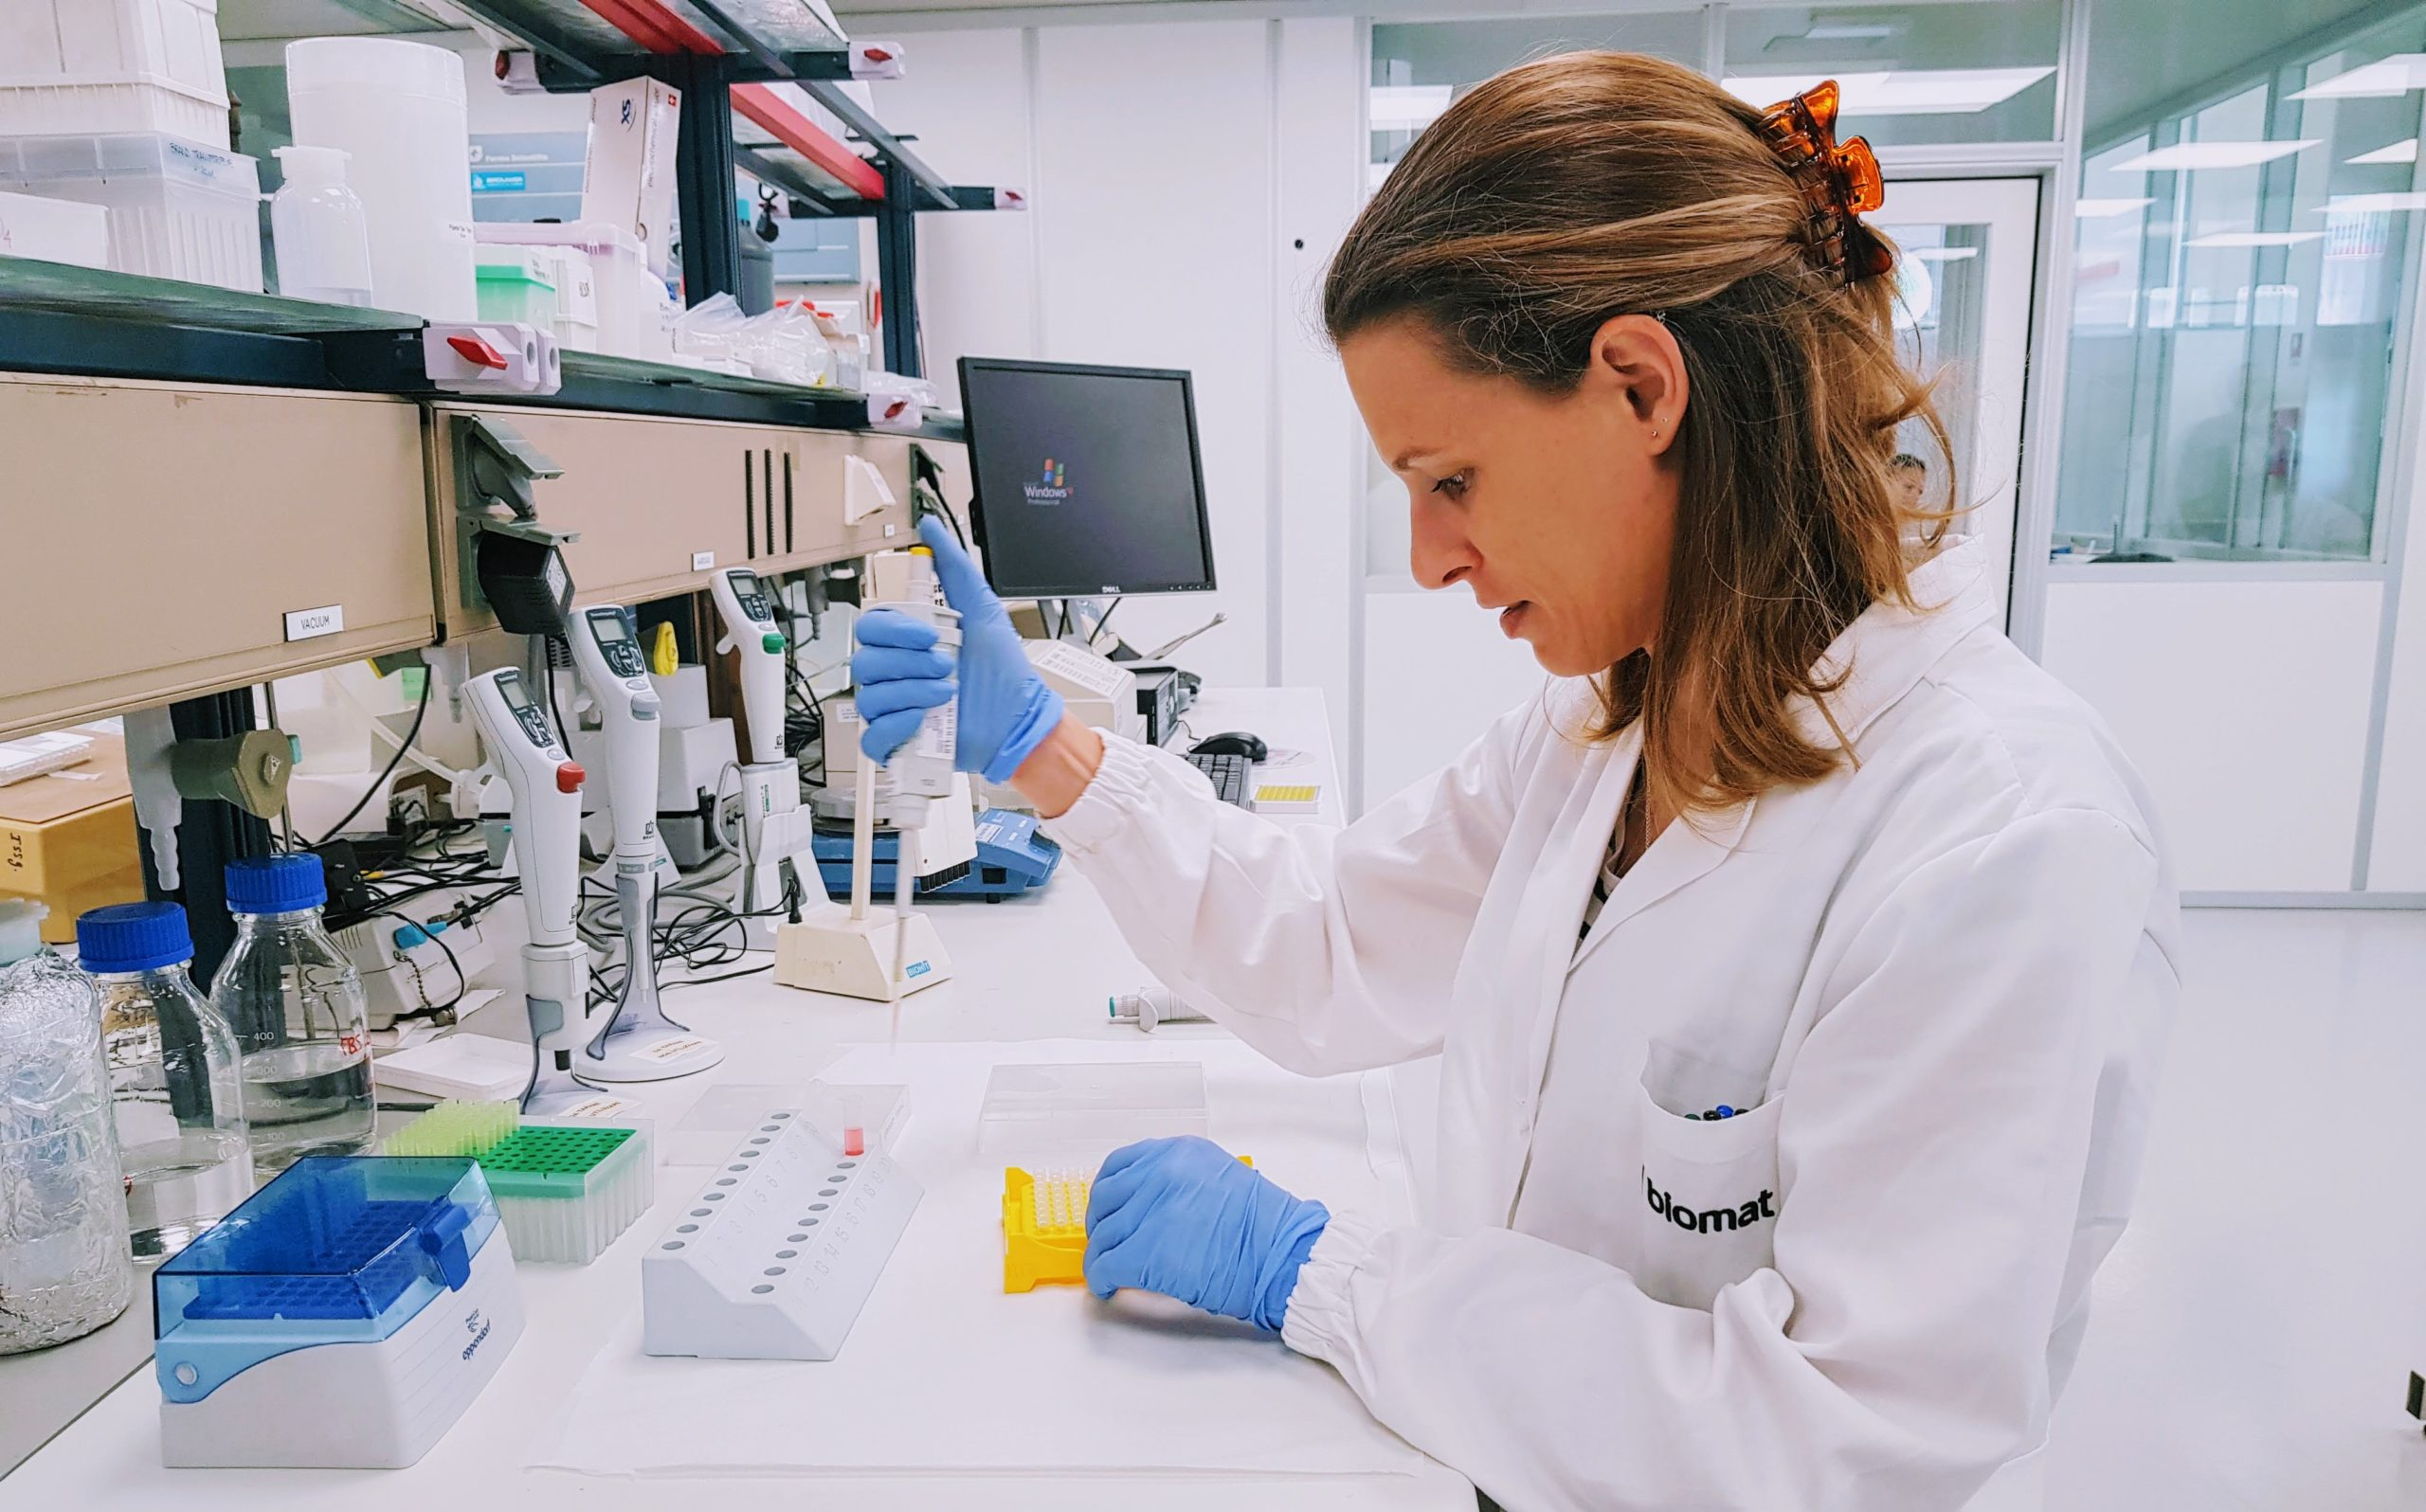 Biomat laboratory